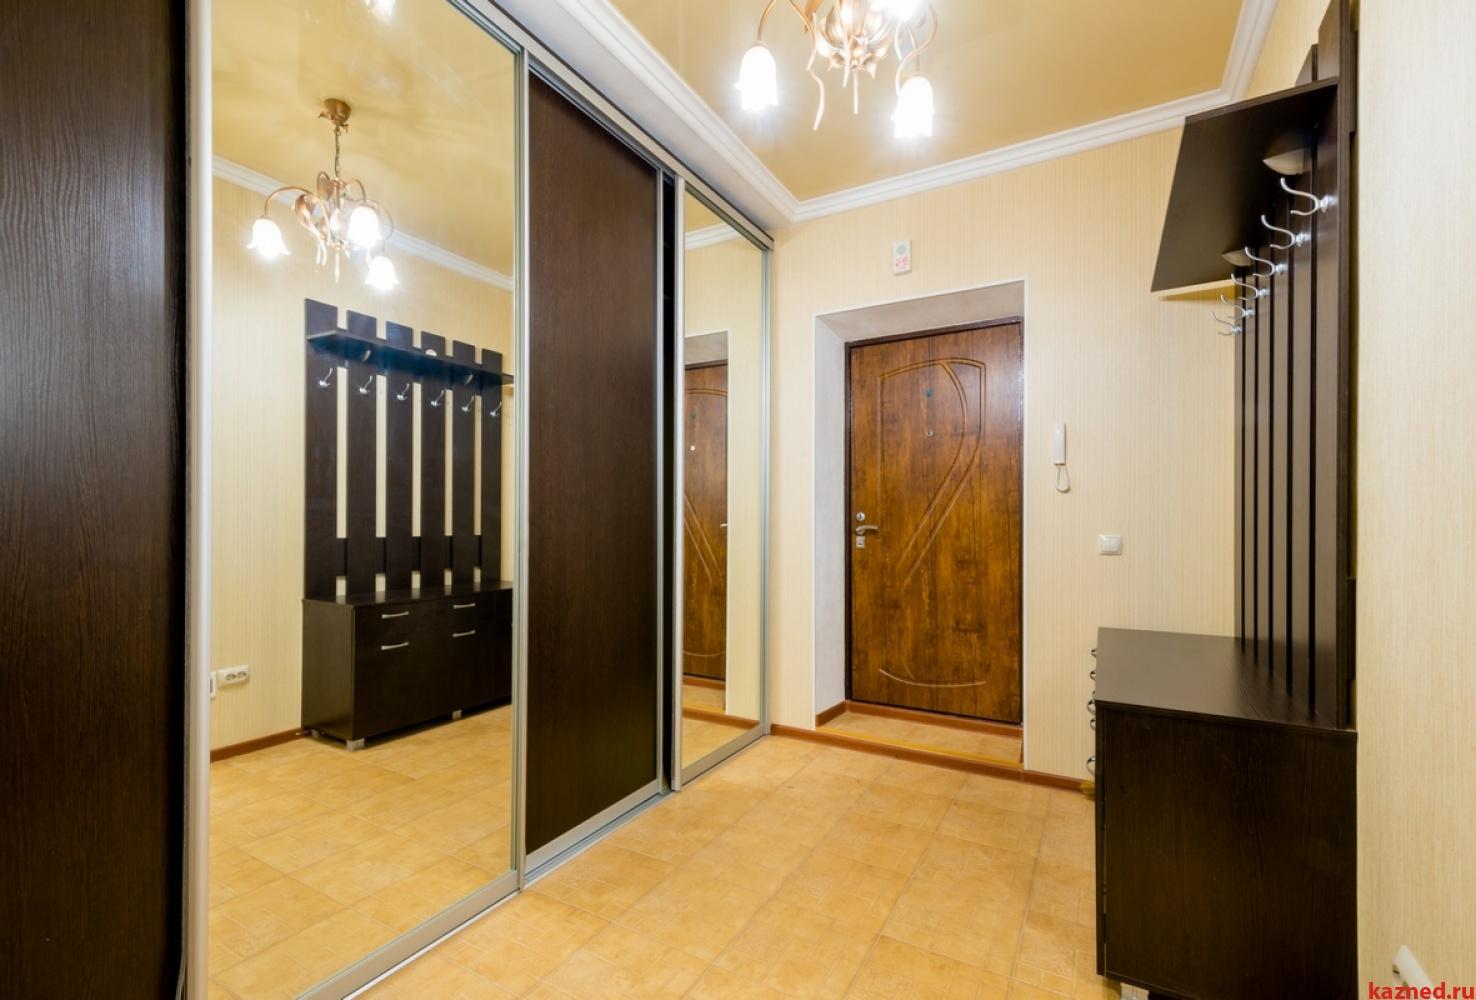 Продажа 2-к квартиры Баки Урманче д.6, 72 м² (миниатюра №16)